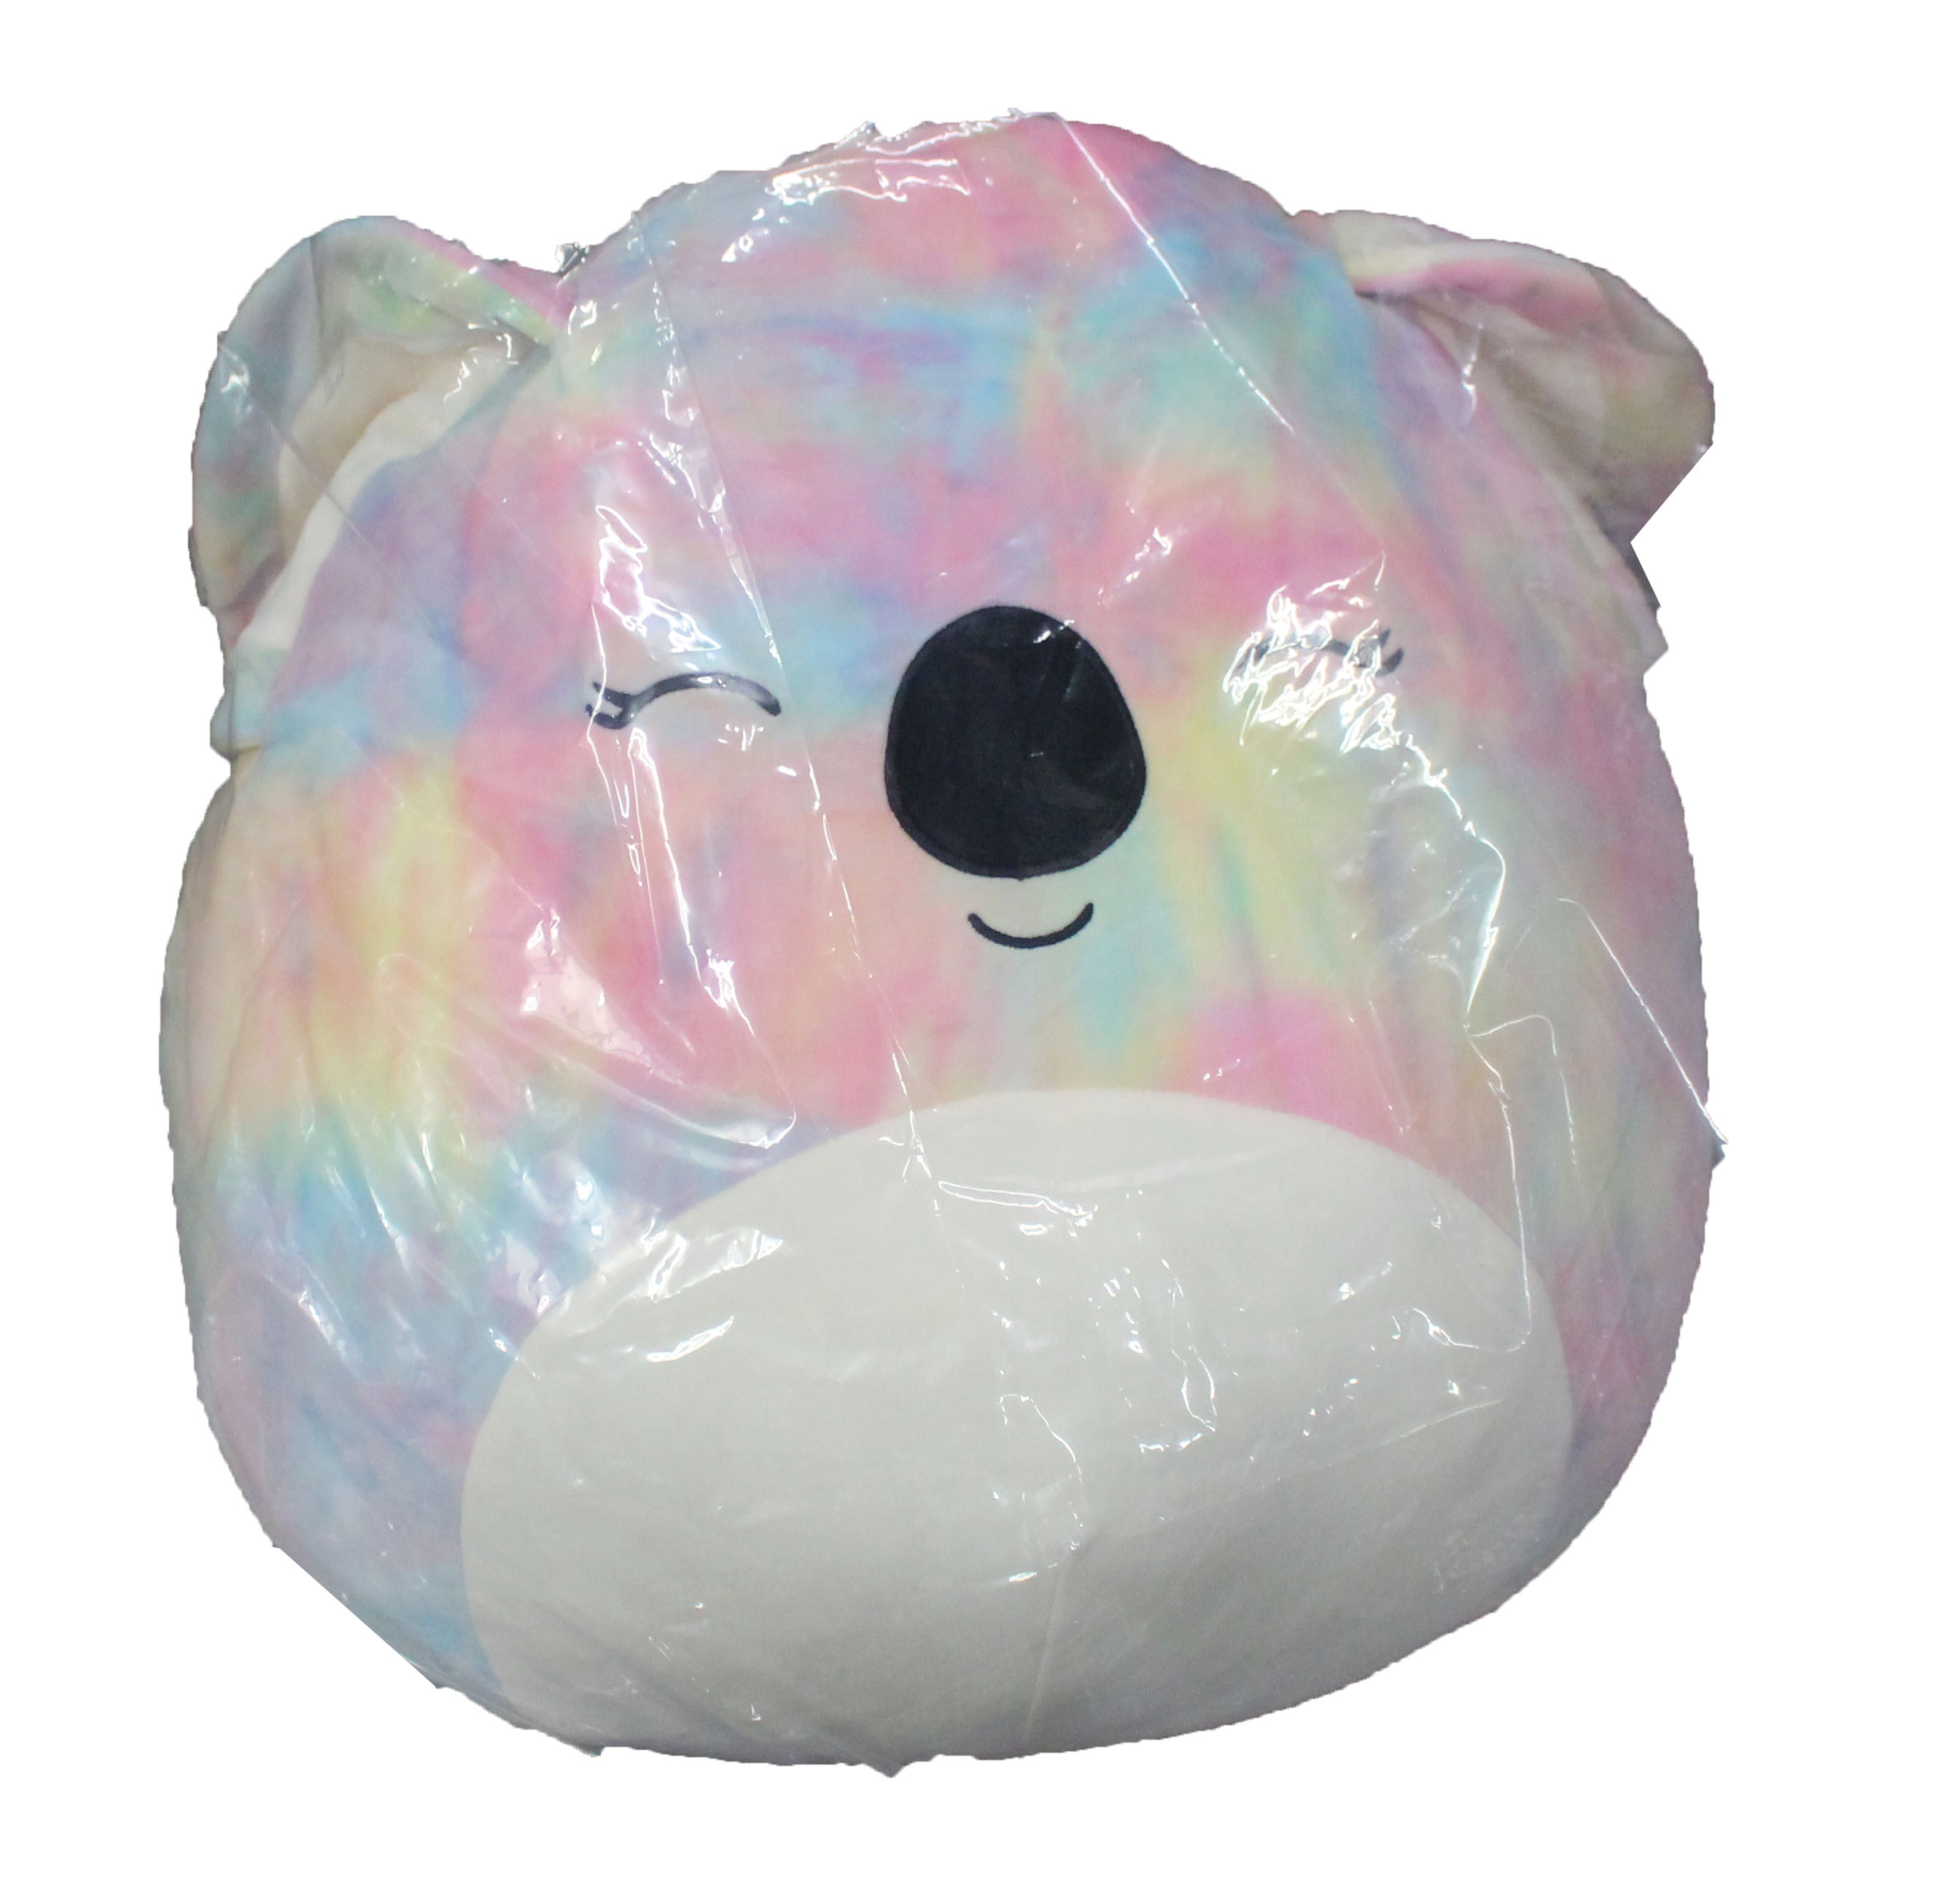 squishmallows by kellytoy 16 in tie dye koala katya plush pillow pet stuffed animal walmart com